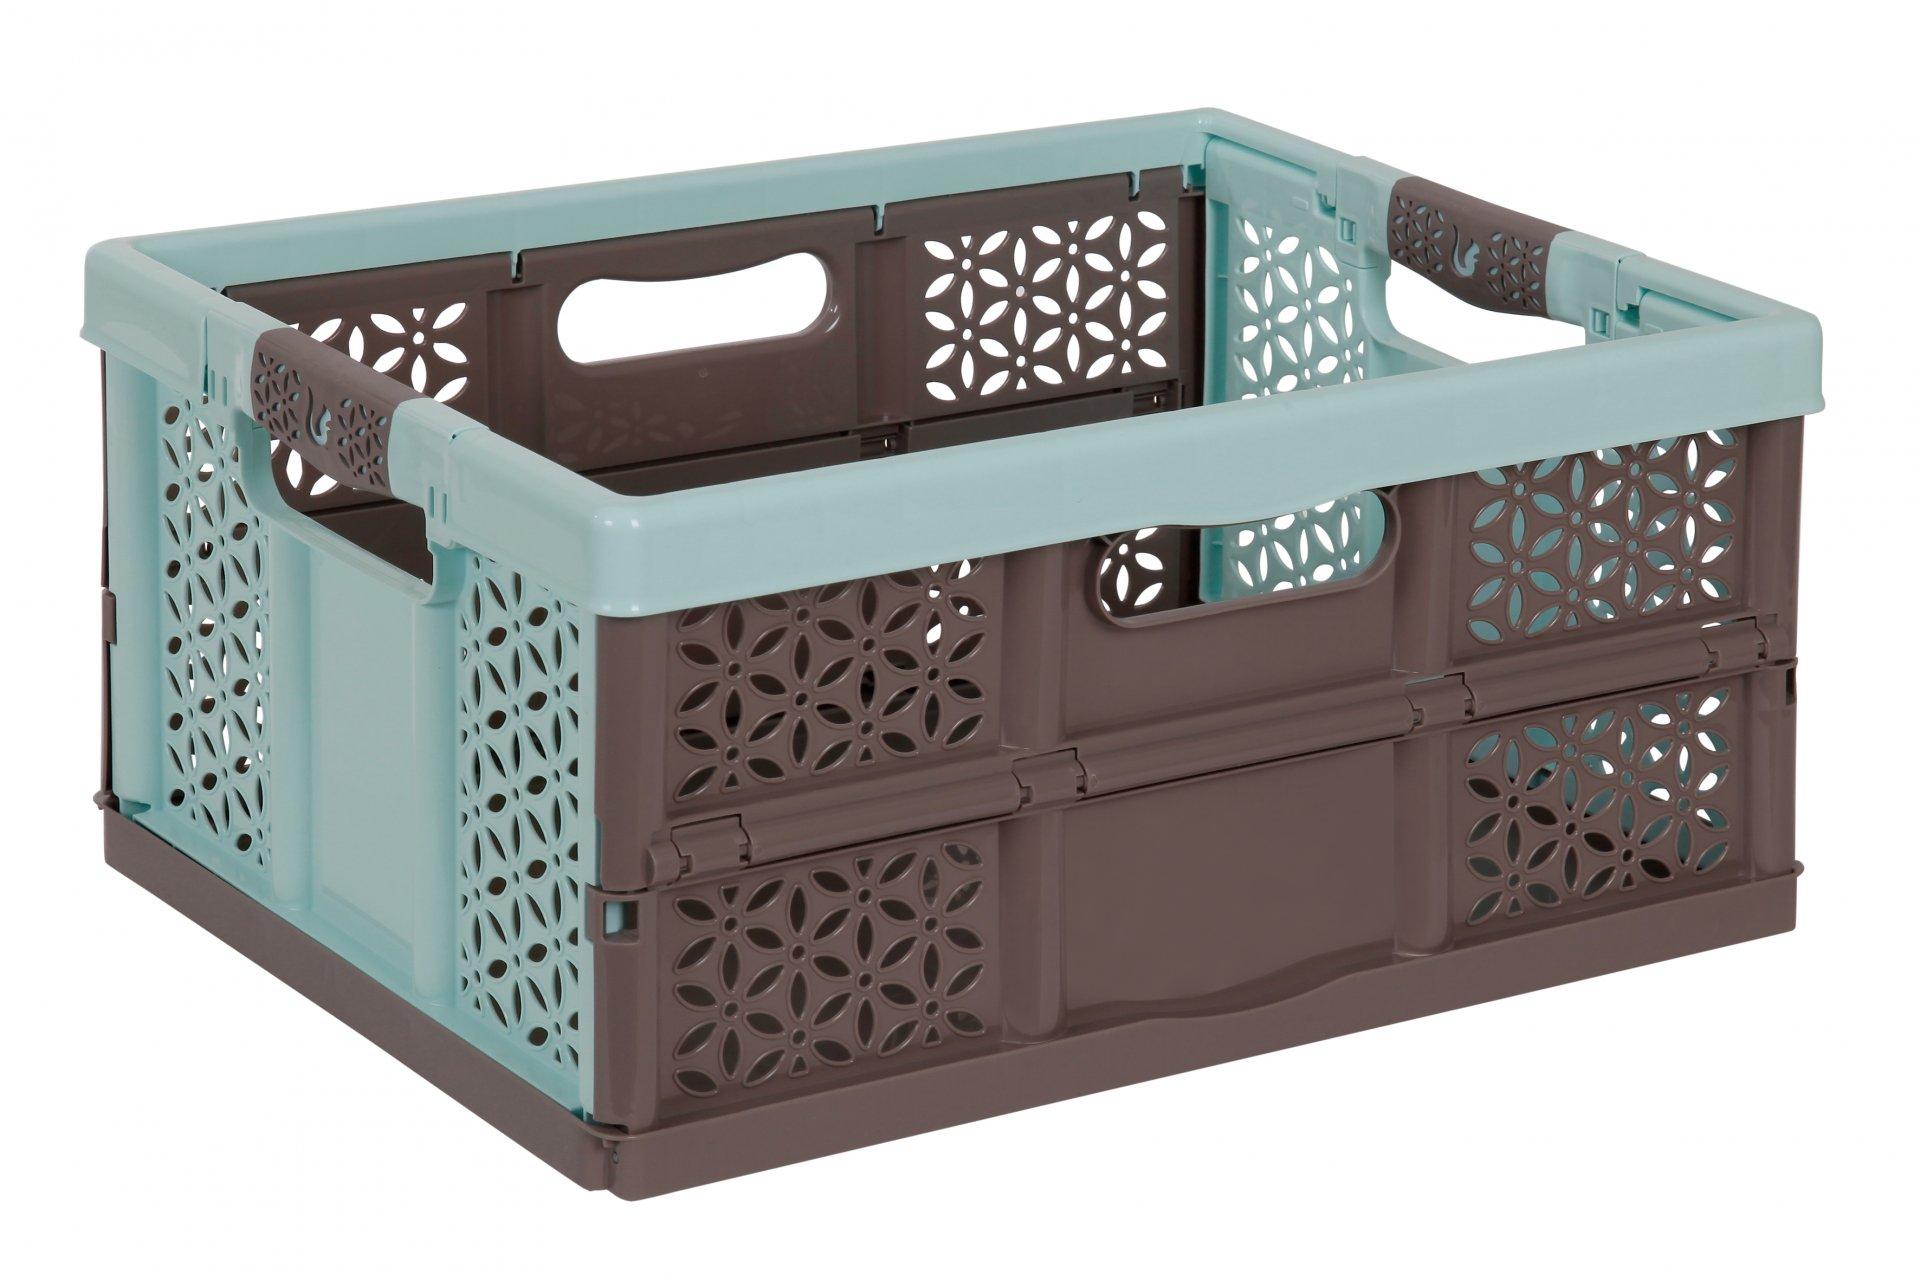 Keeeper Skládací box s měkkými úchyty lea, modrá/taupe 32L